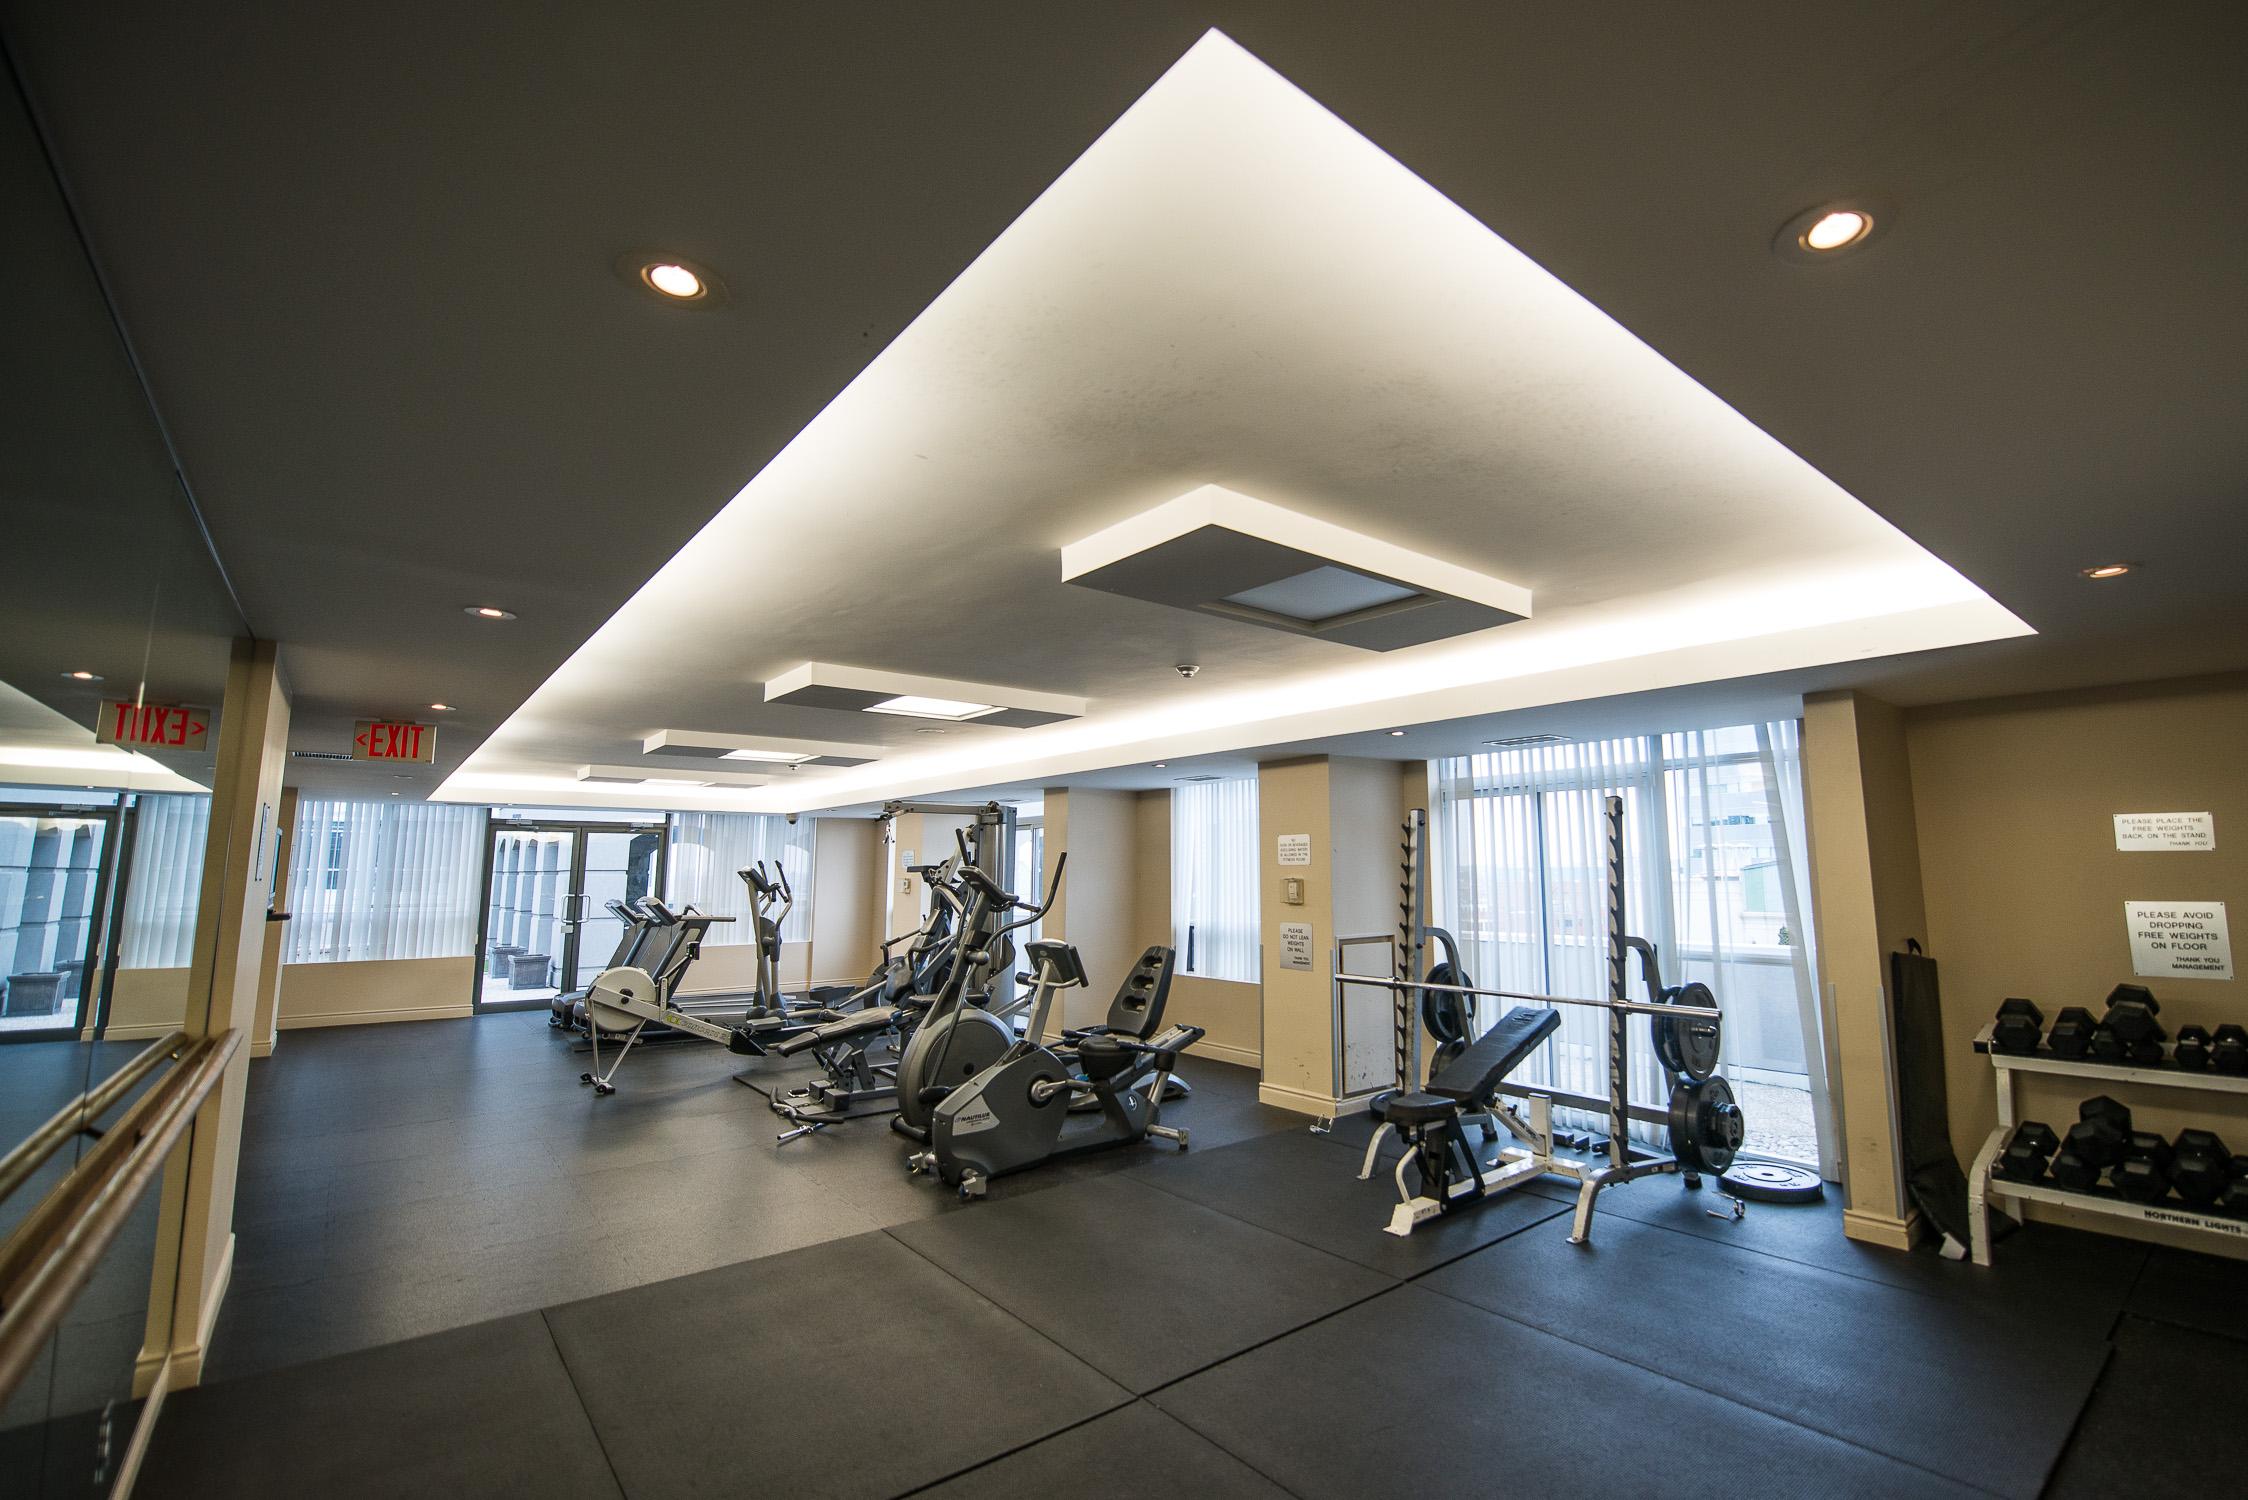 executive rentals toronto fitness centre in university plaza 17th floor